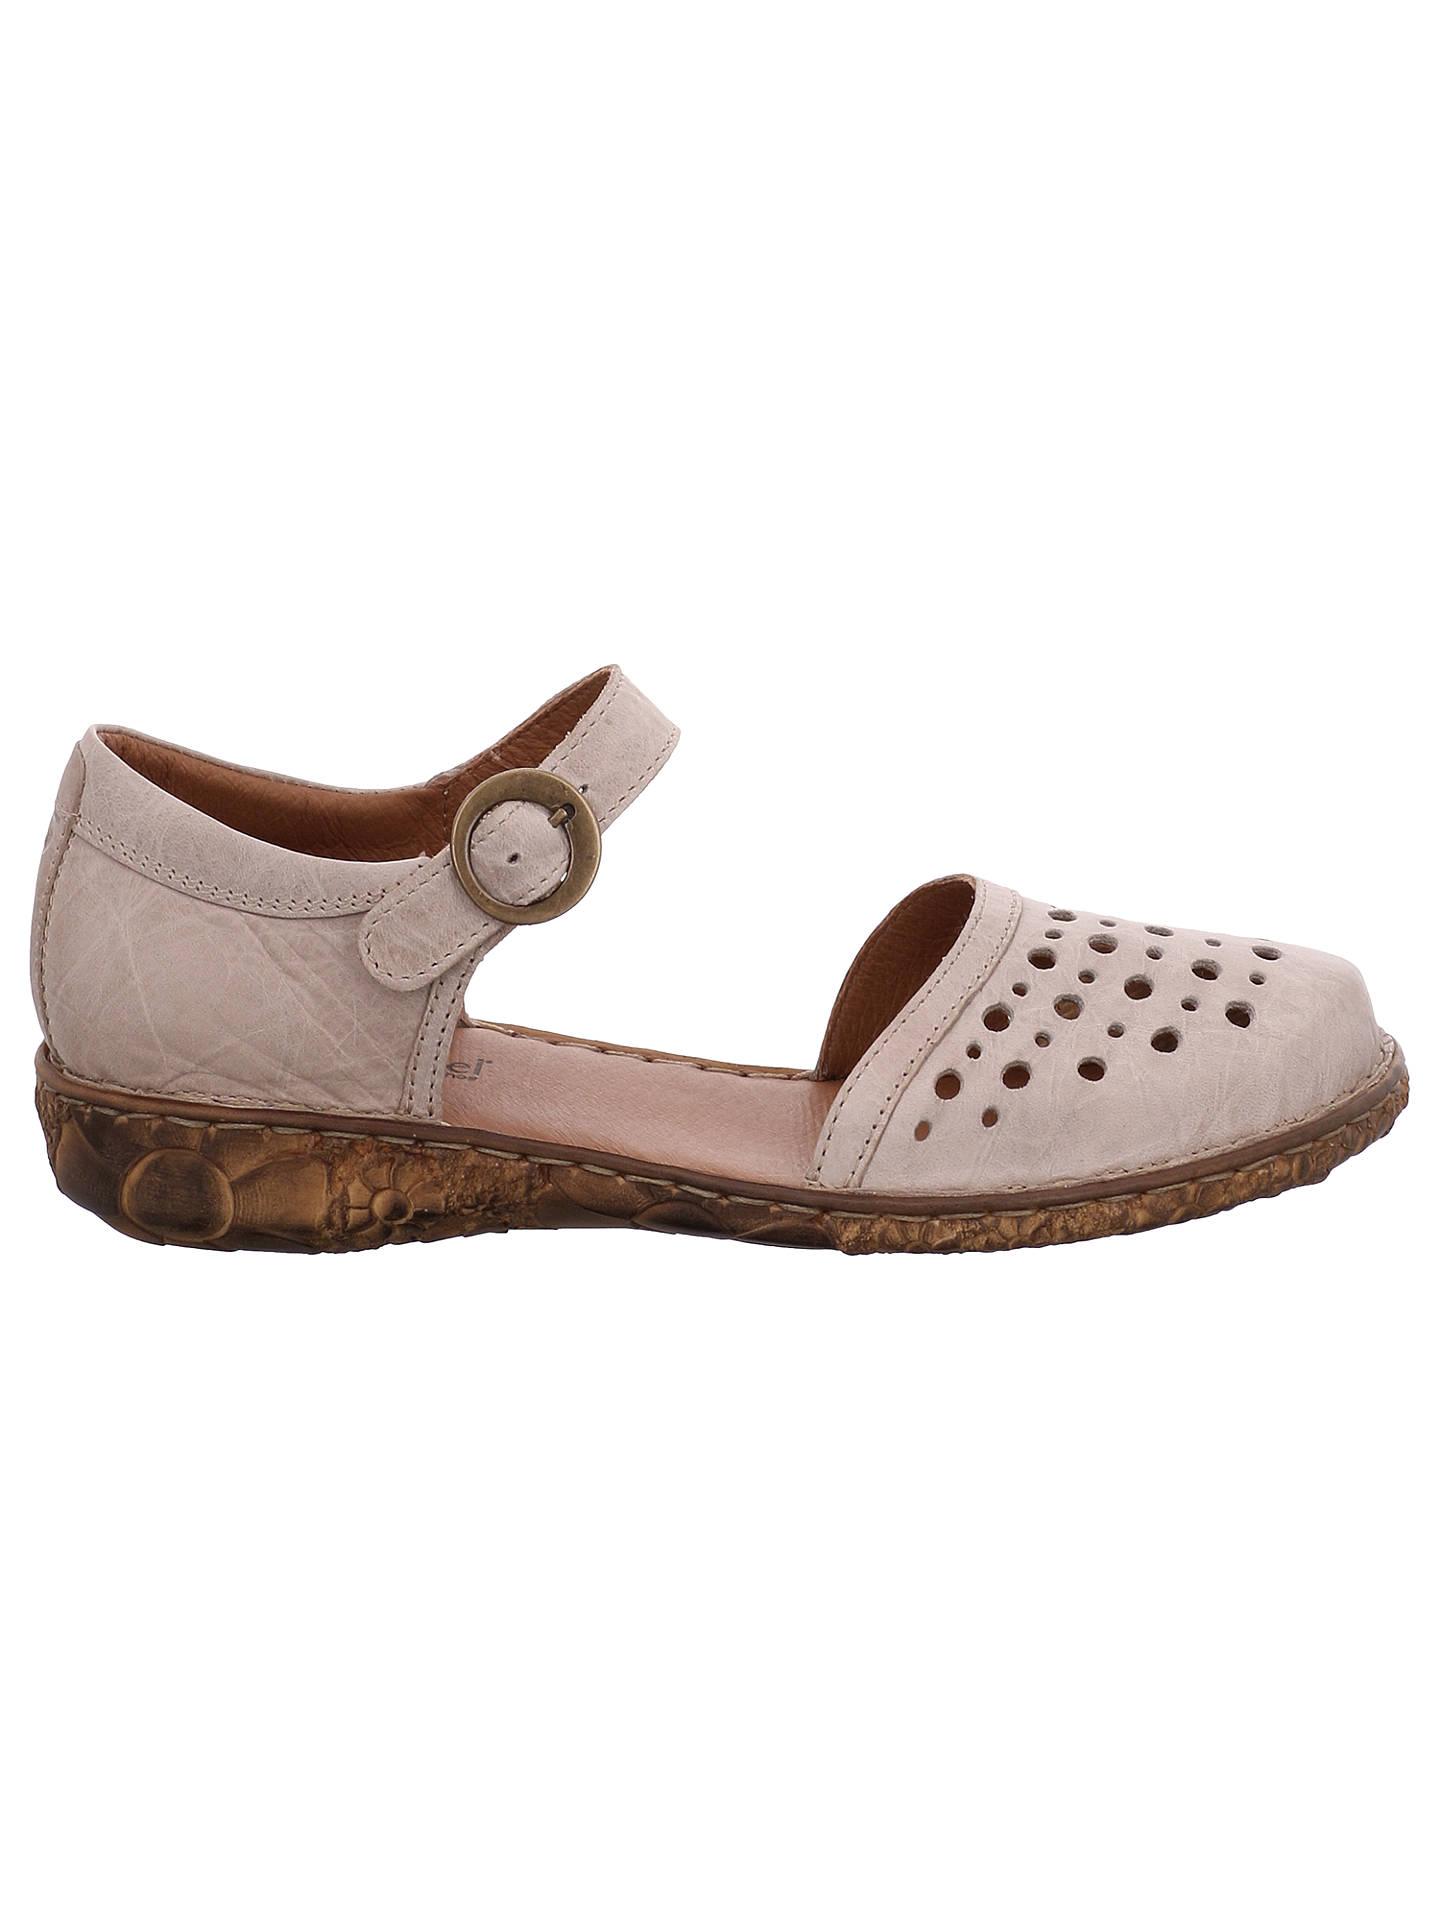 178c66954bb9 Buy Josef Seibel Rosalie 19 Flat Sandals